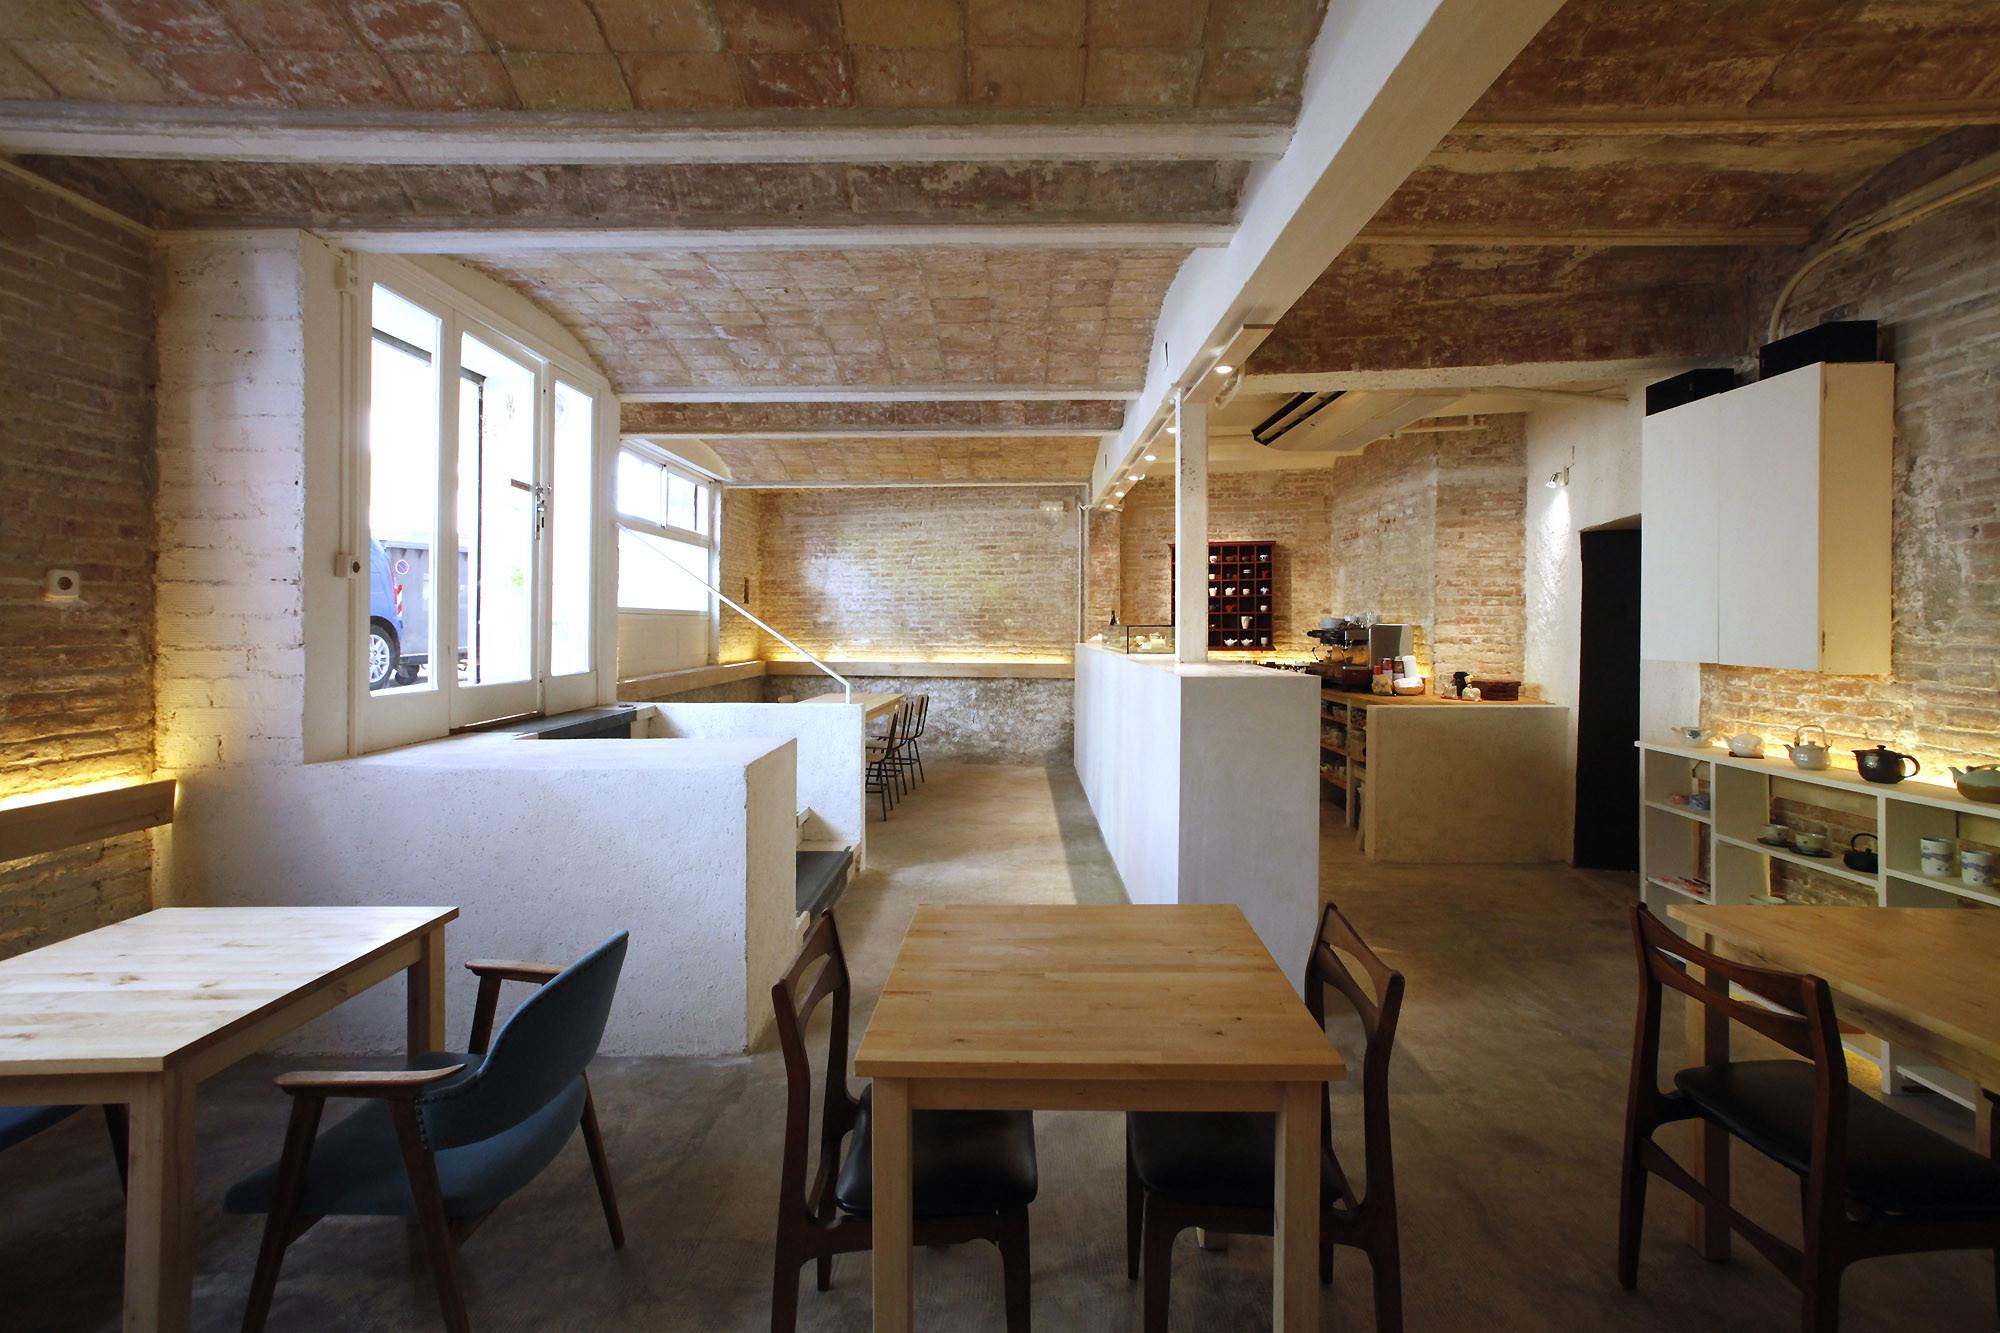 Usagui Teahouse / Kazuya Morita Architecture Studio